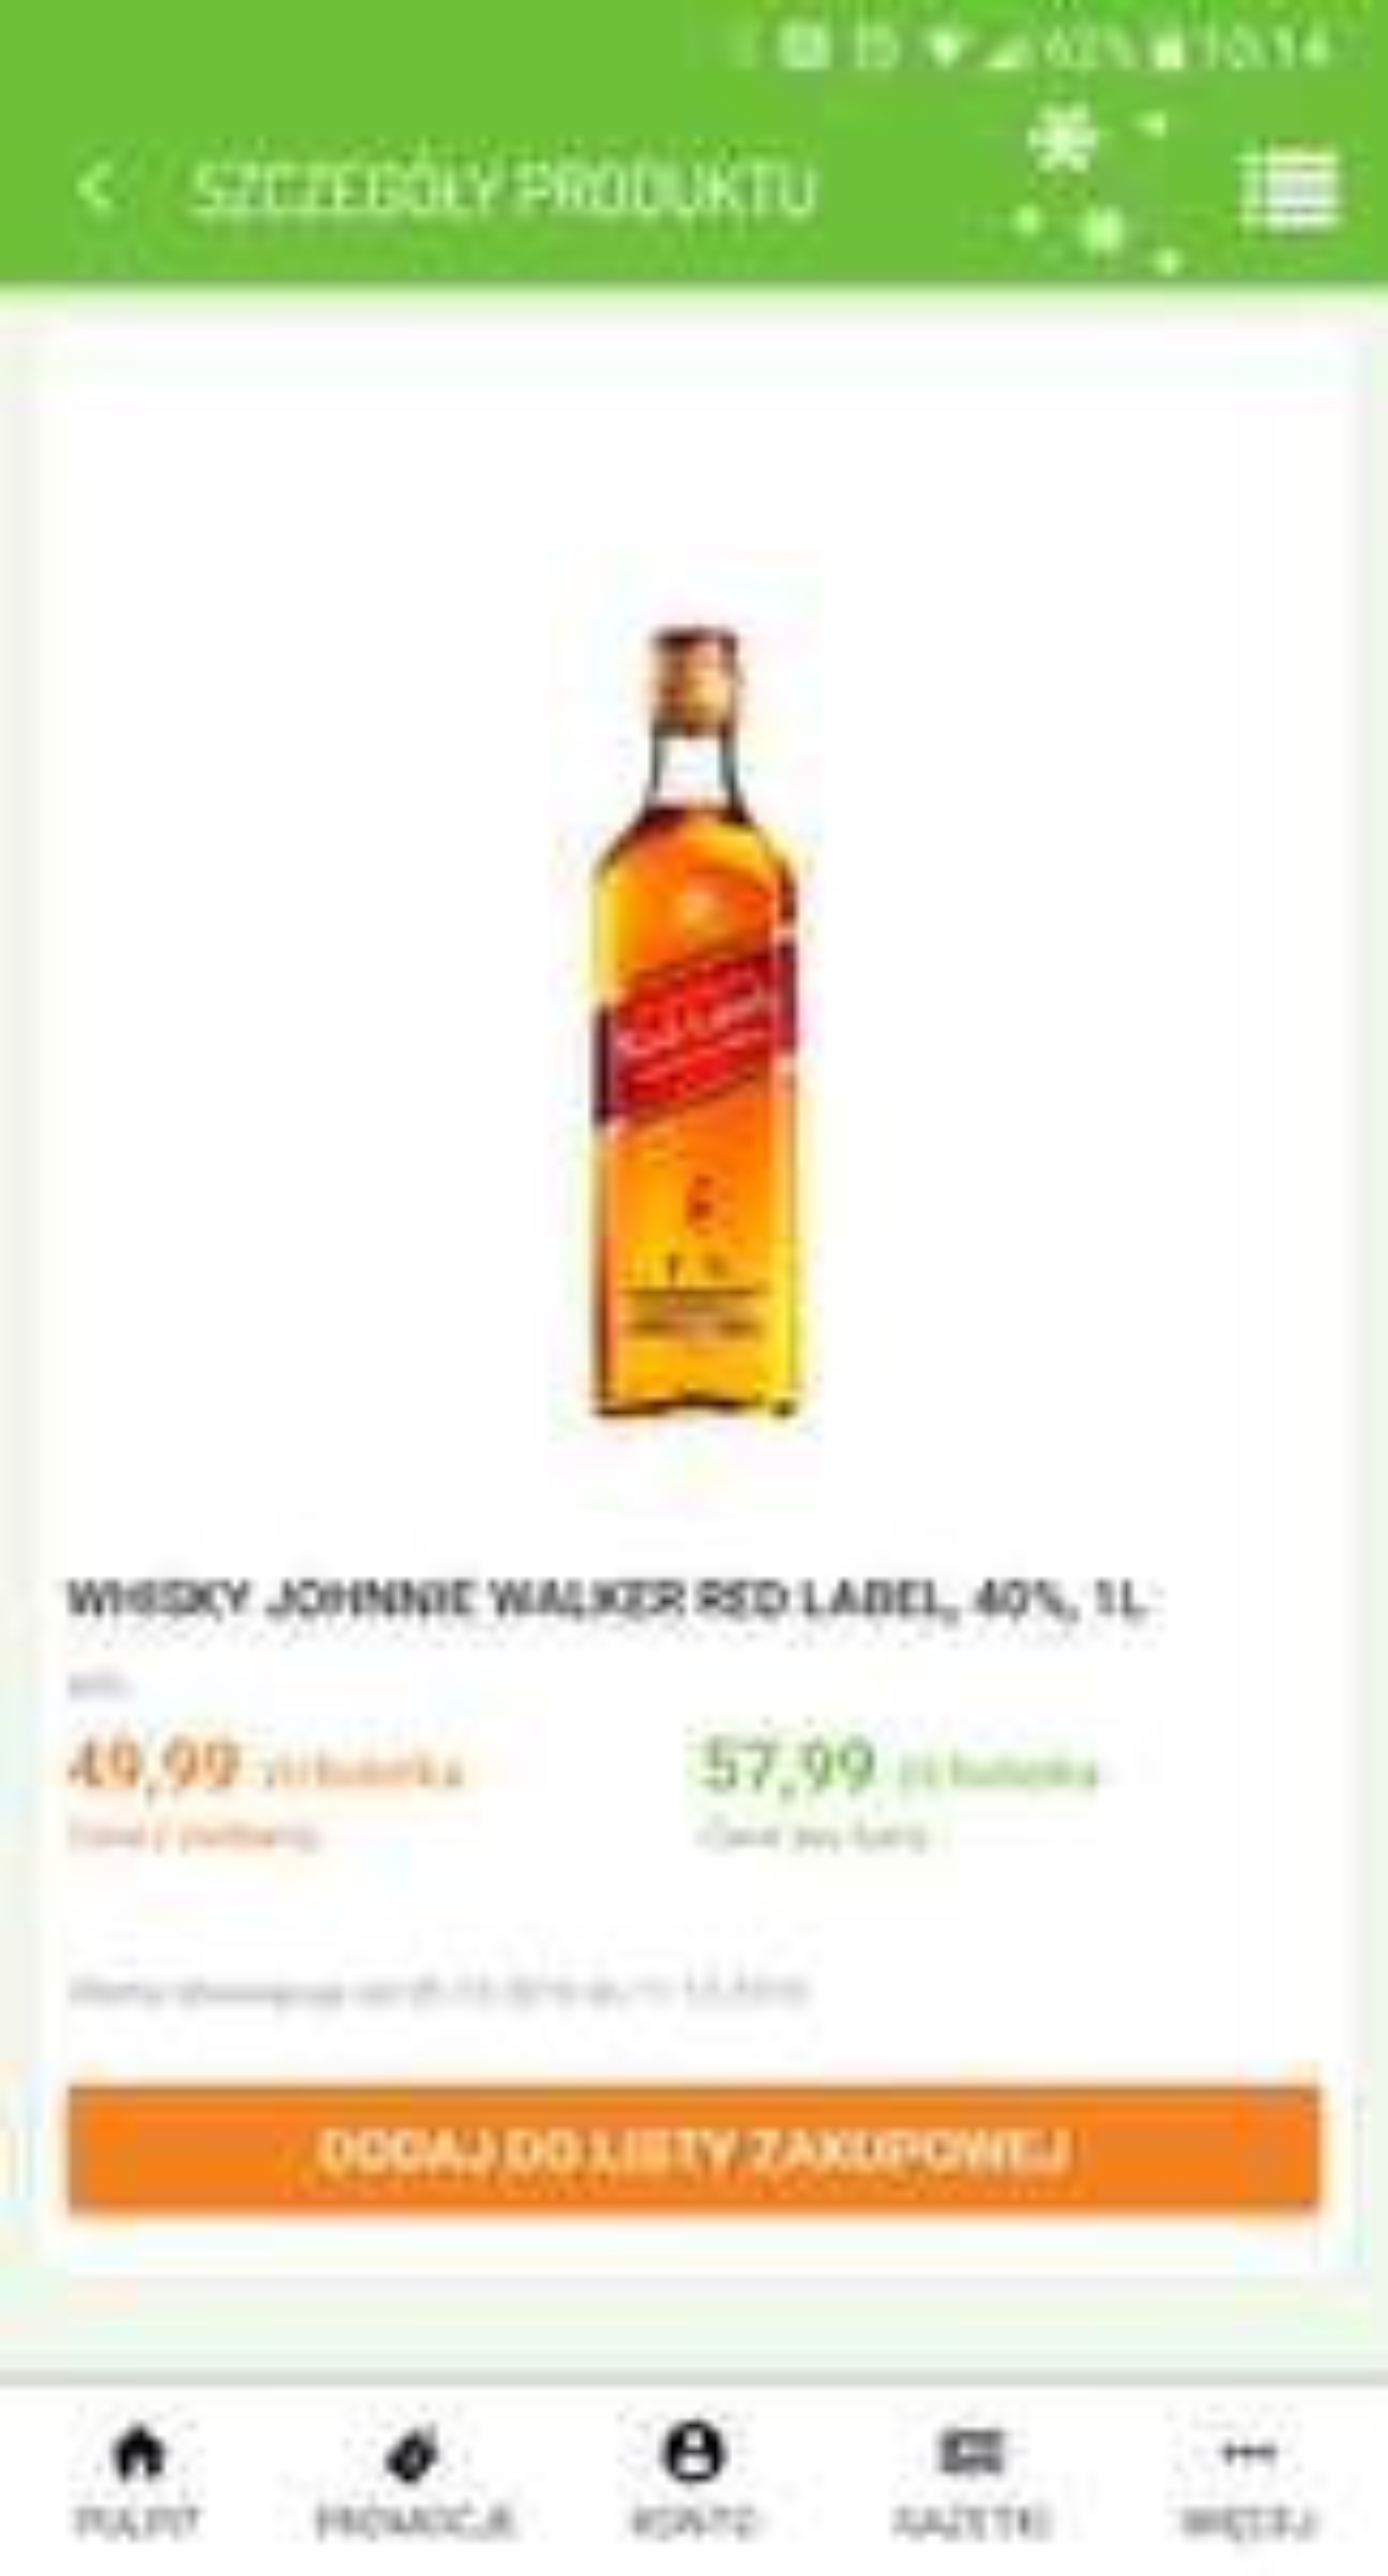 Whisky Johnnie Walker Red Label, 40%, 1l @ Delikatesy Centrum